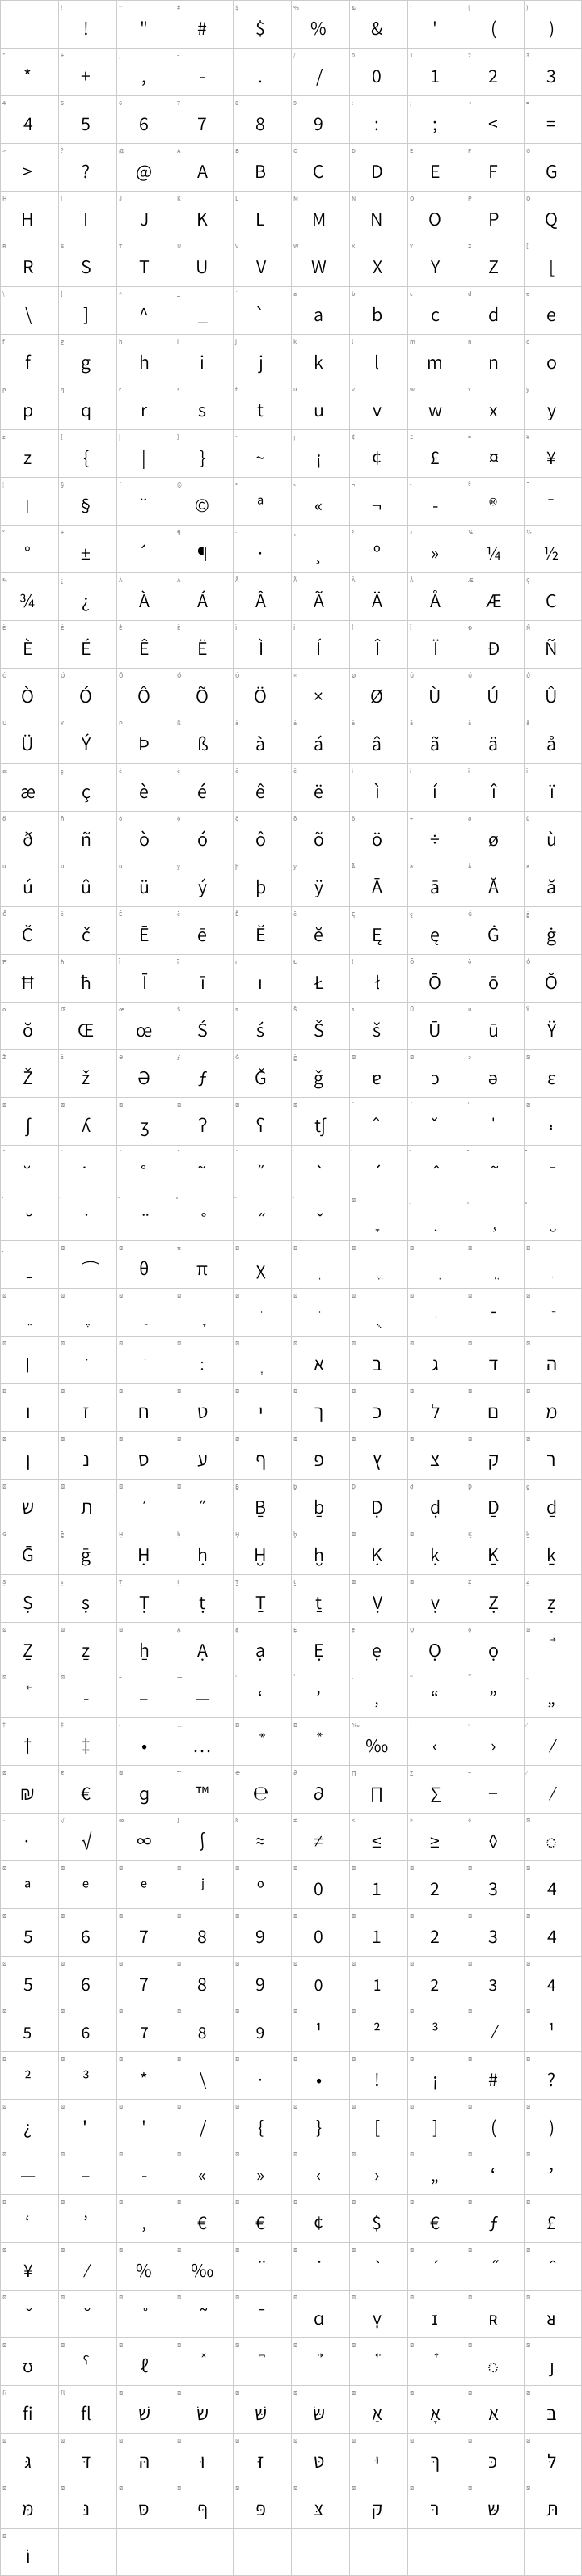 Assistant Font Free by hafontia » Font Squirrel